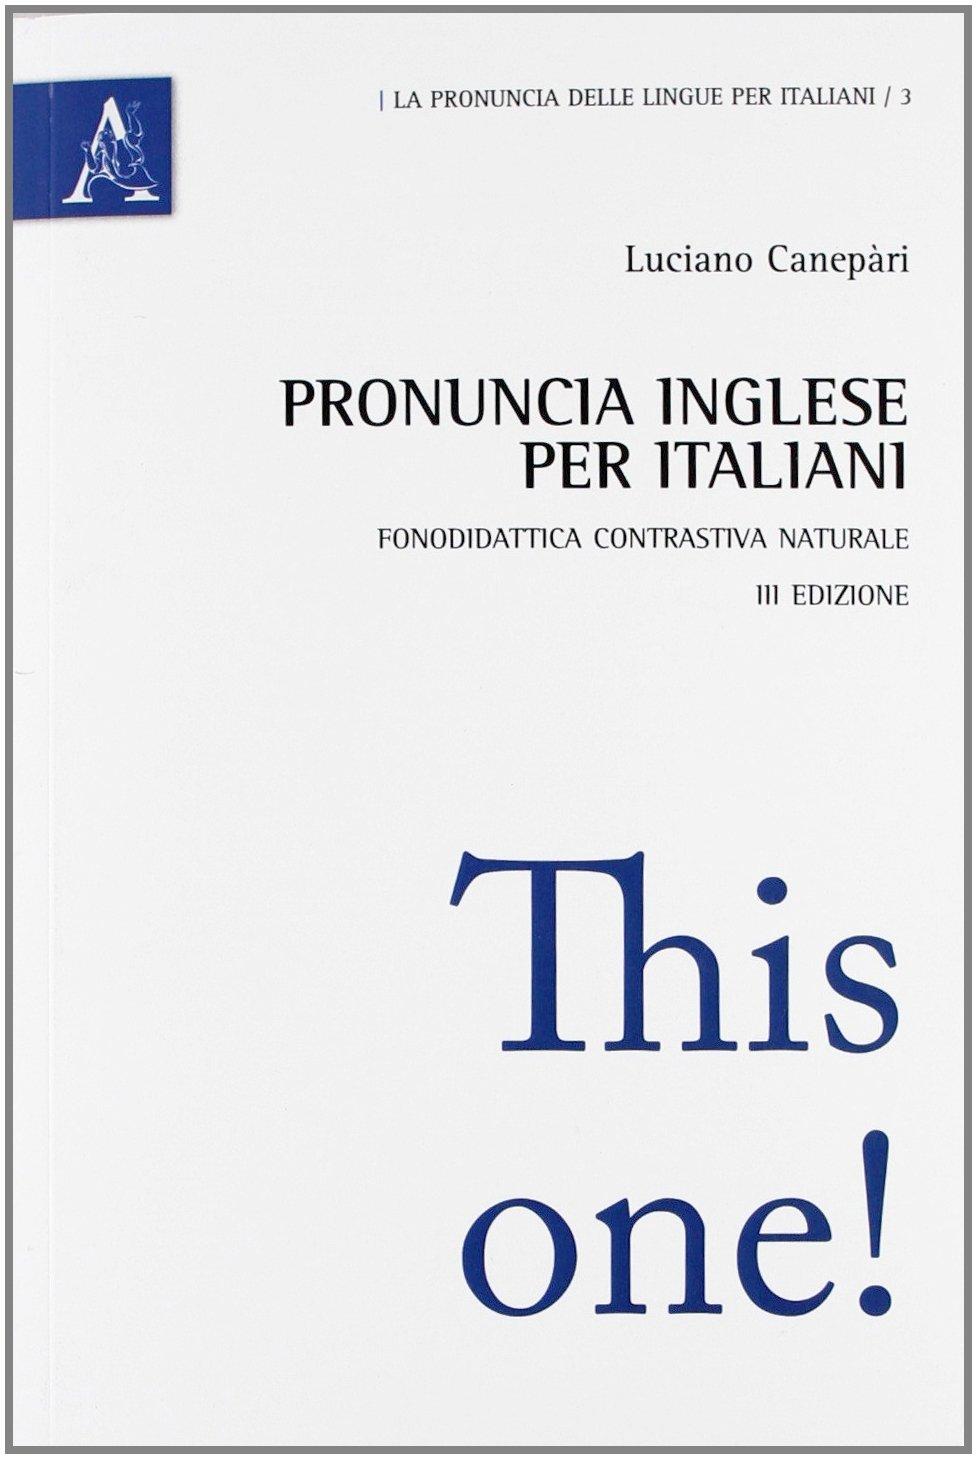 PRONUNCIA INGLESE PER ITALIANI